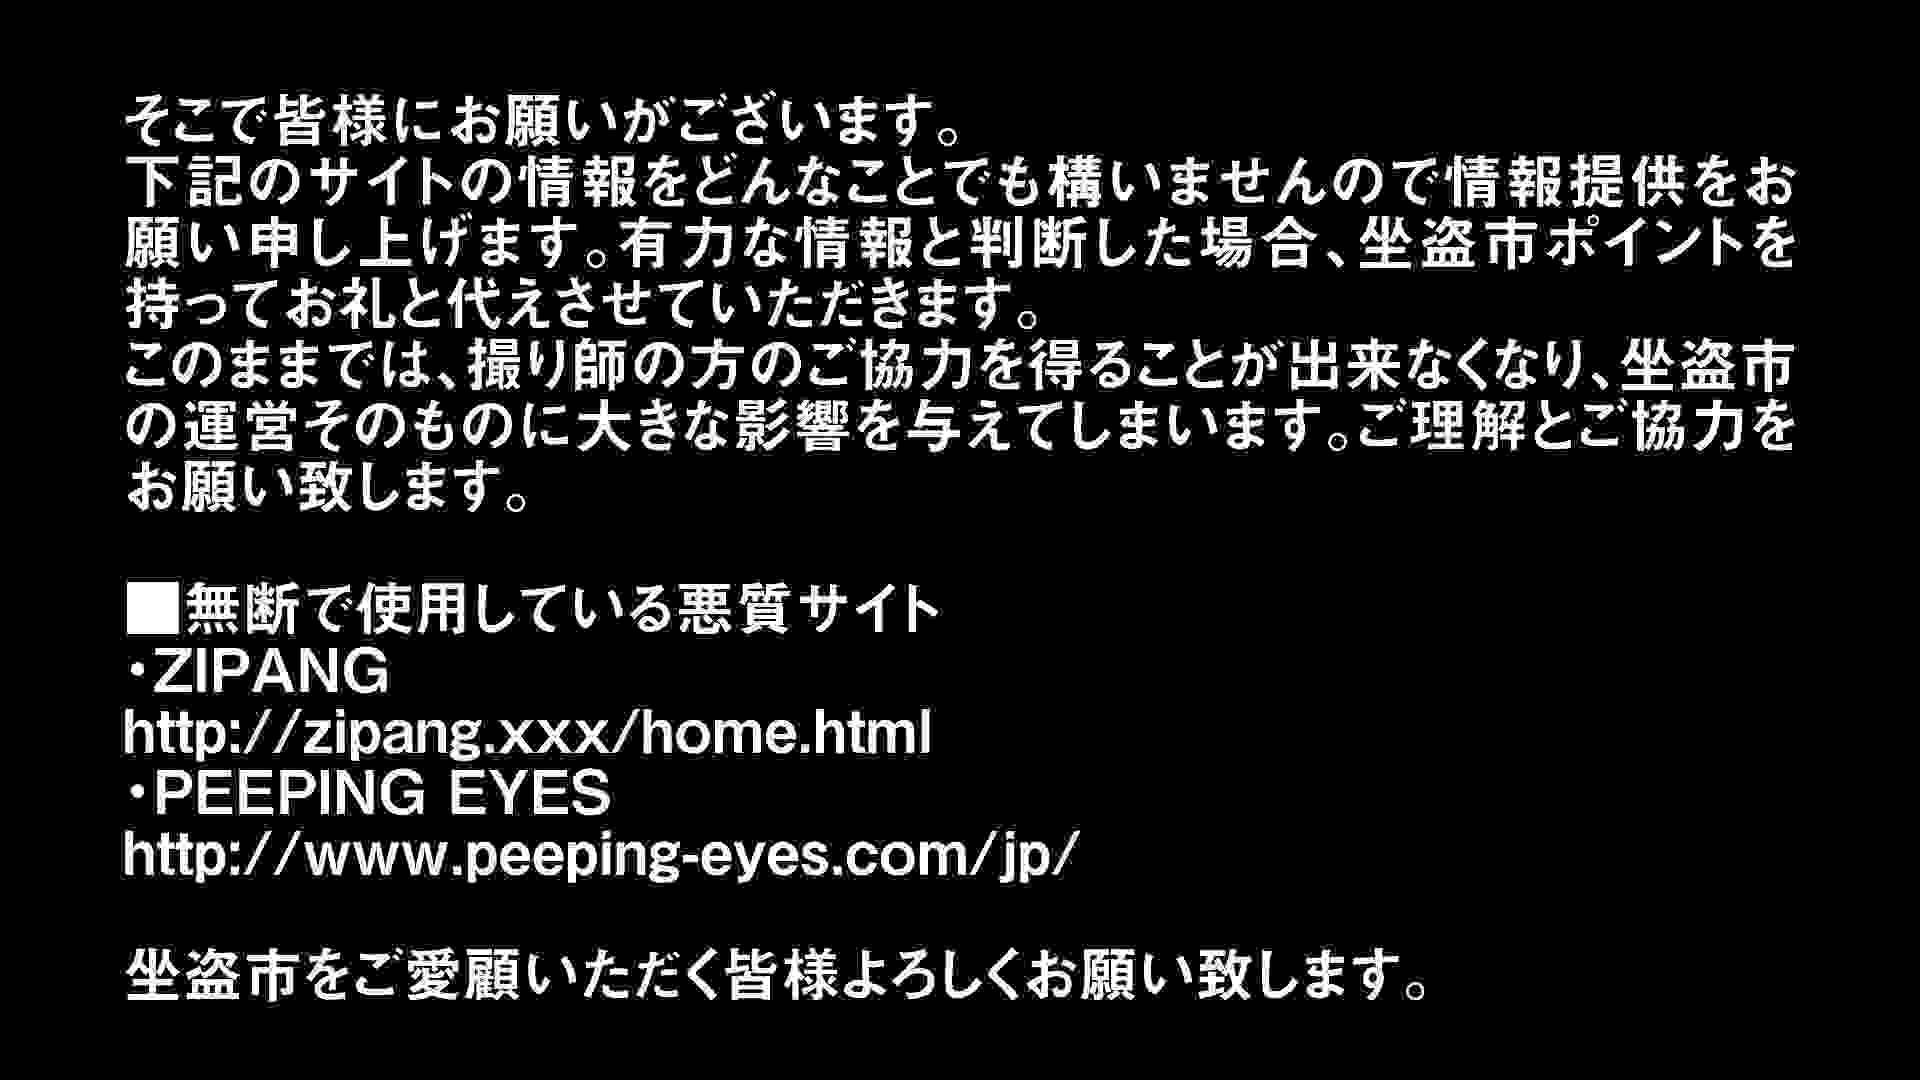 Aquaな露天風呂Vol.304 盗撮大放出 SEX無修正画像 65連発 3